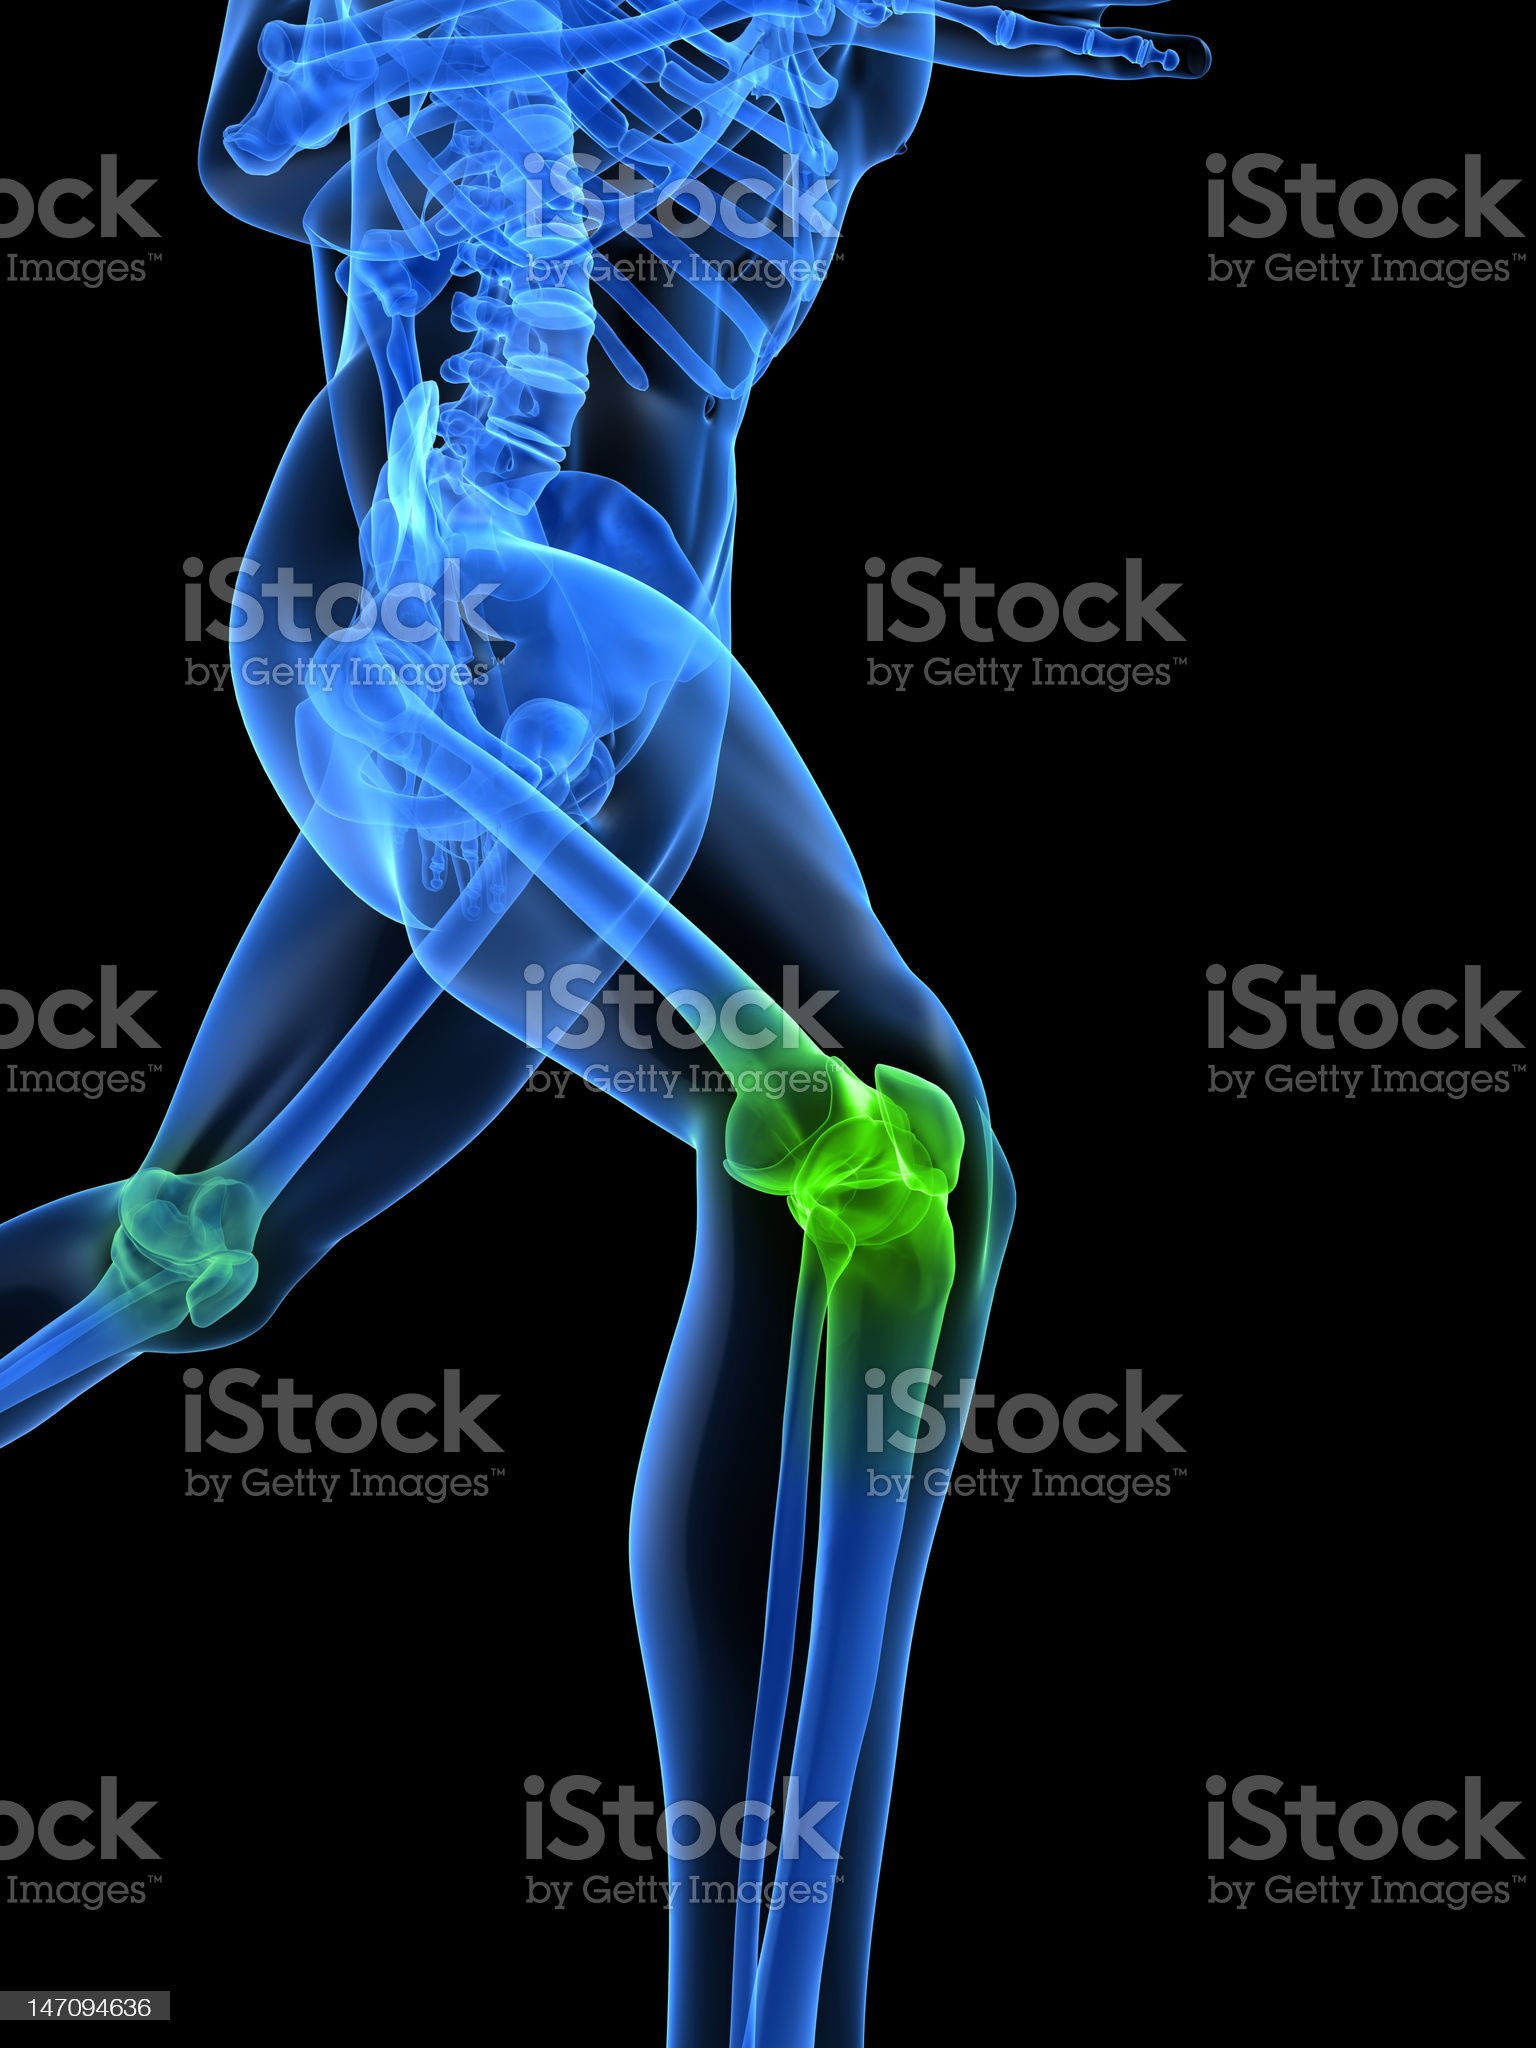 healthy knee royalty-free stock photo